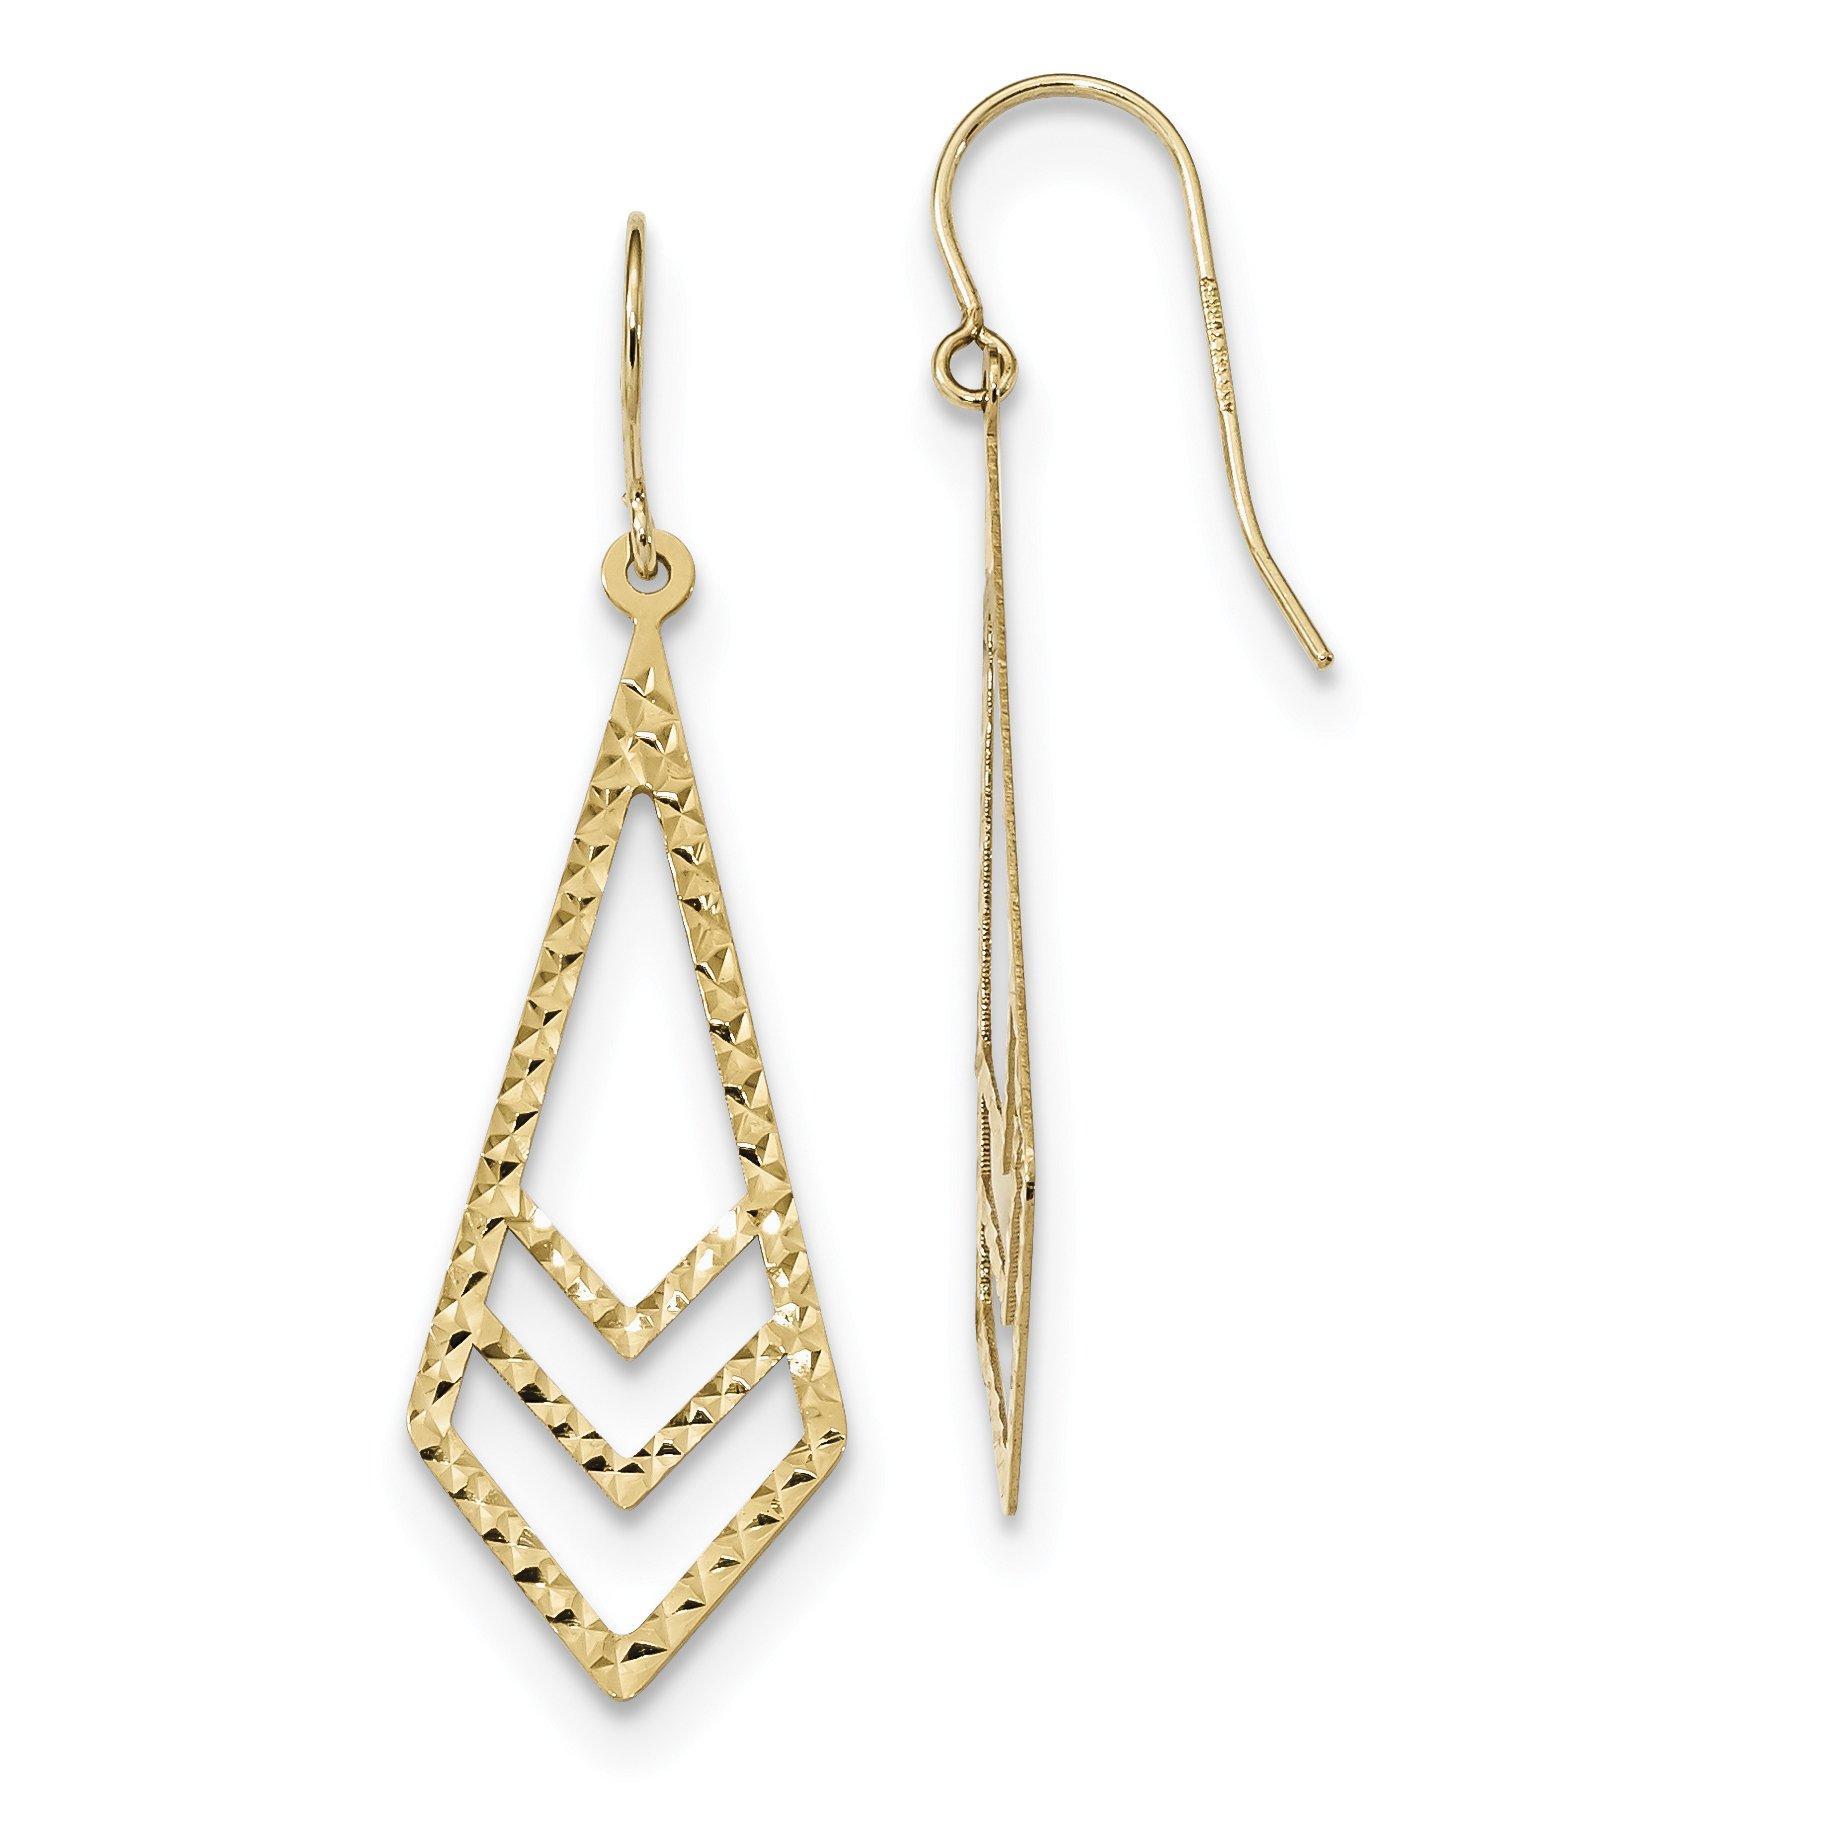 ICE CARATS 14k Yellow Gold Textured Drop Dangle Chandelier Earrings Fine Jewelry Gift Set For Women Heart